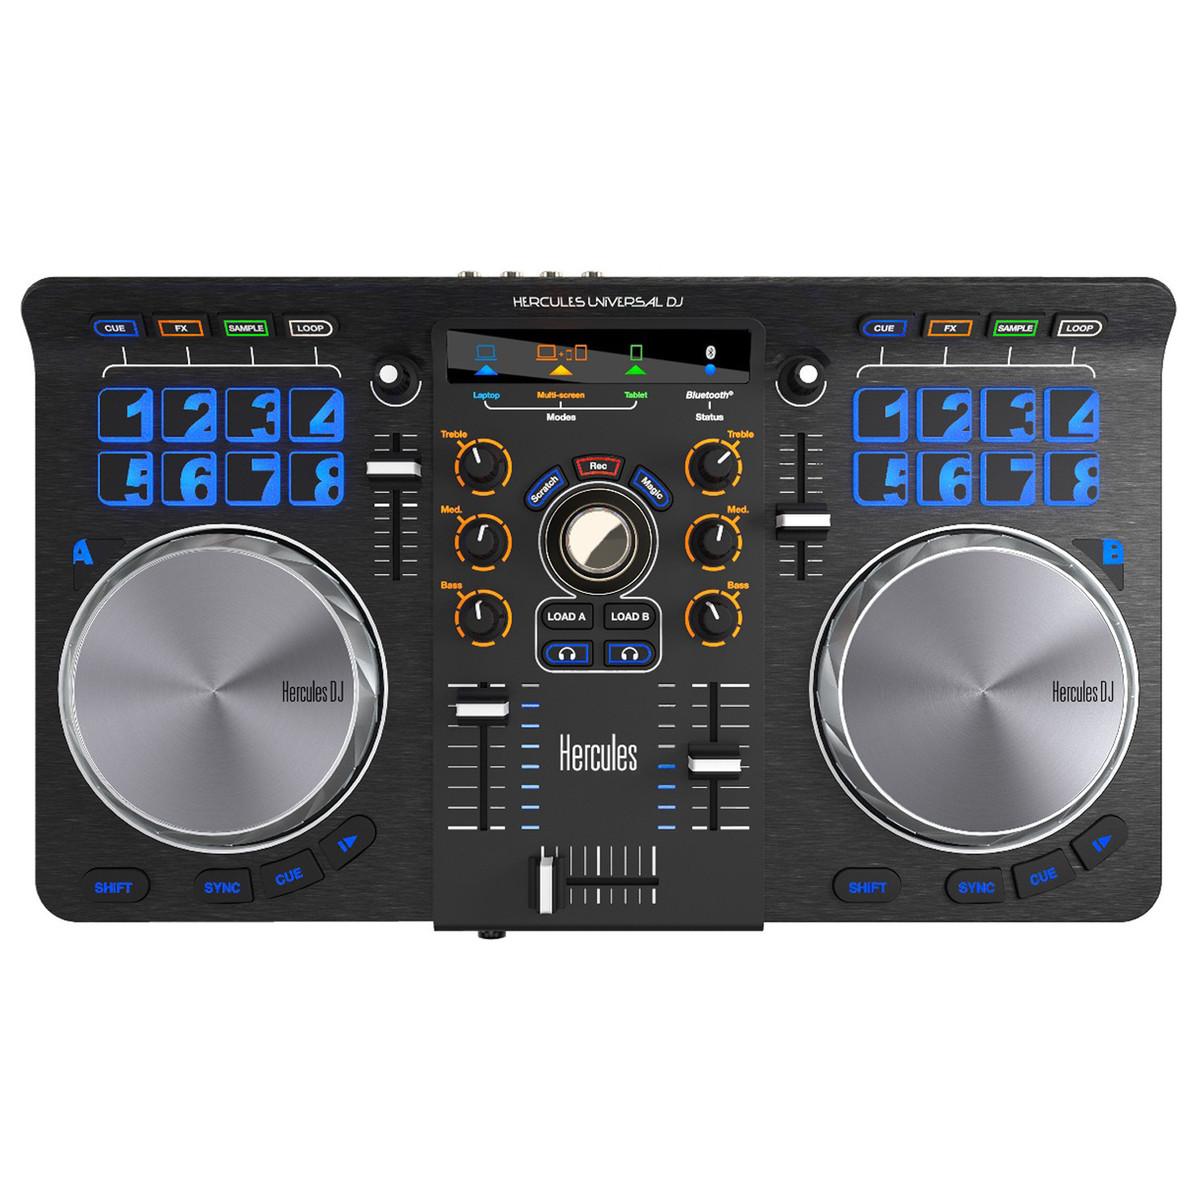 hercules universal dj controller at gear4music